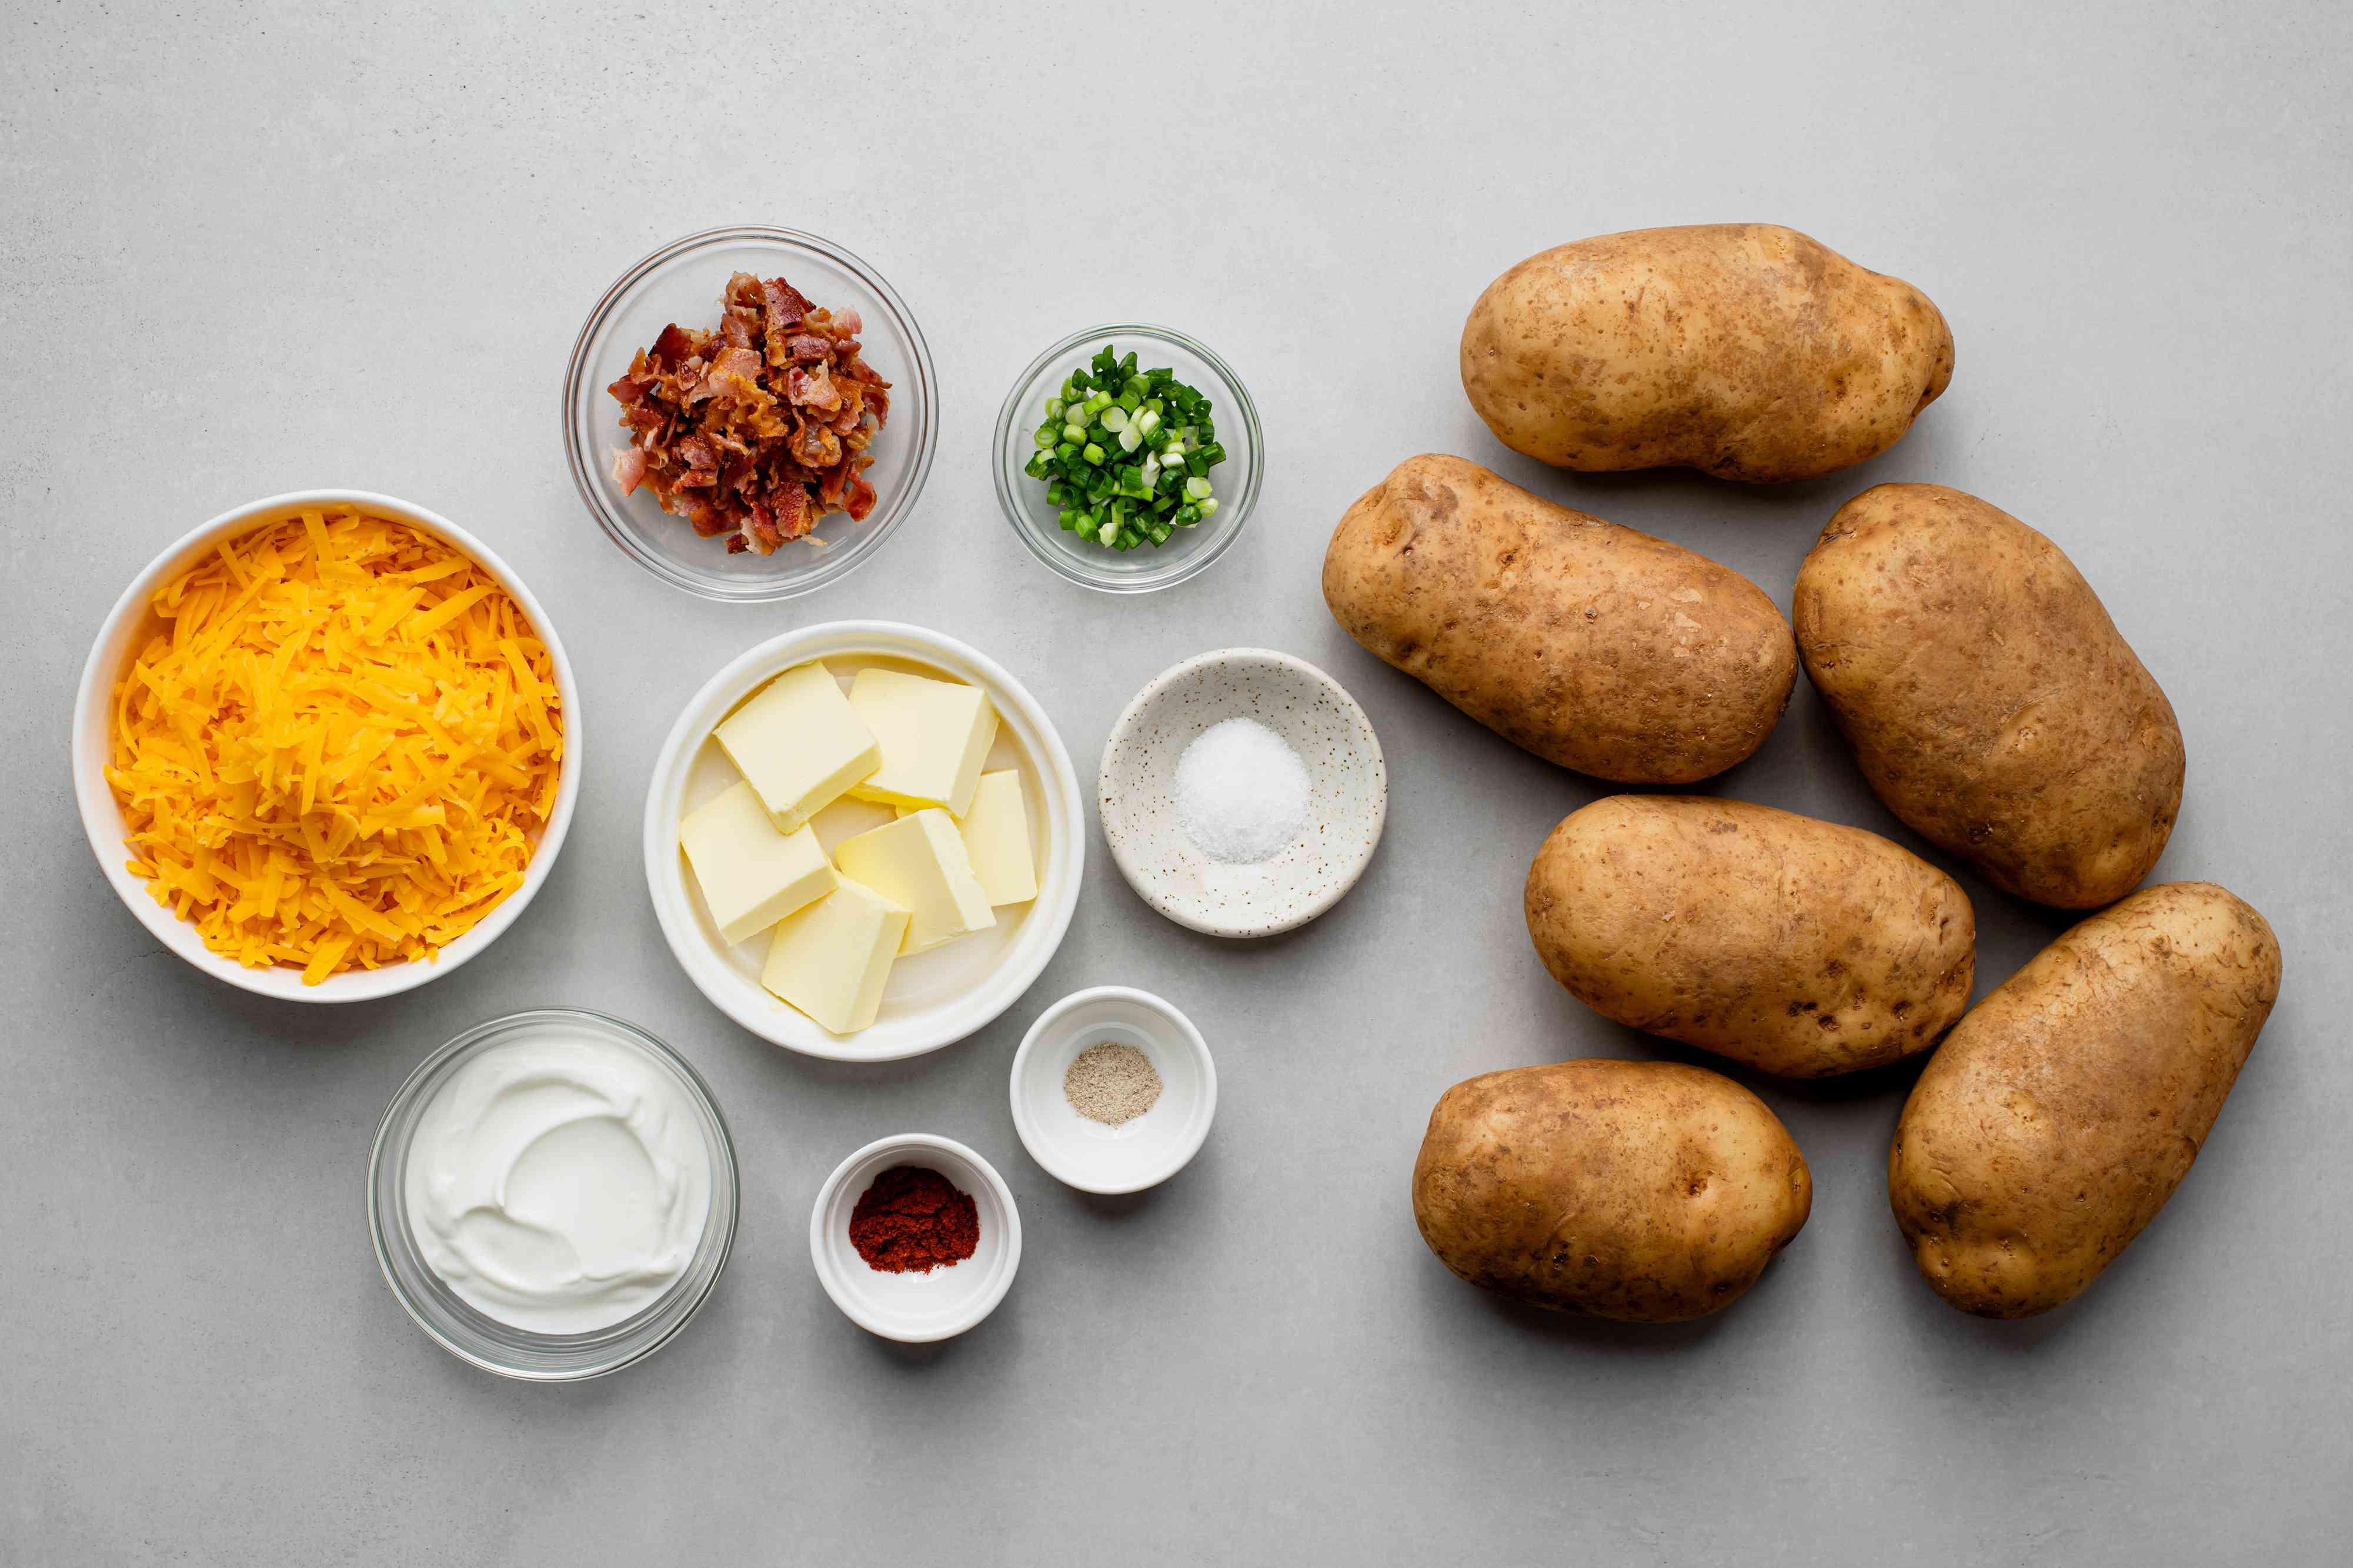 Baked stuffed potato ingredients